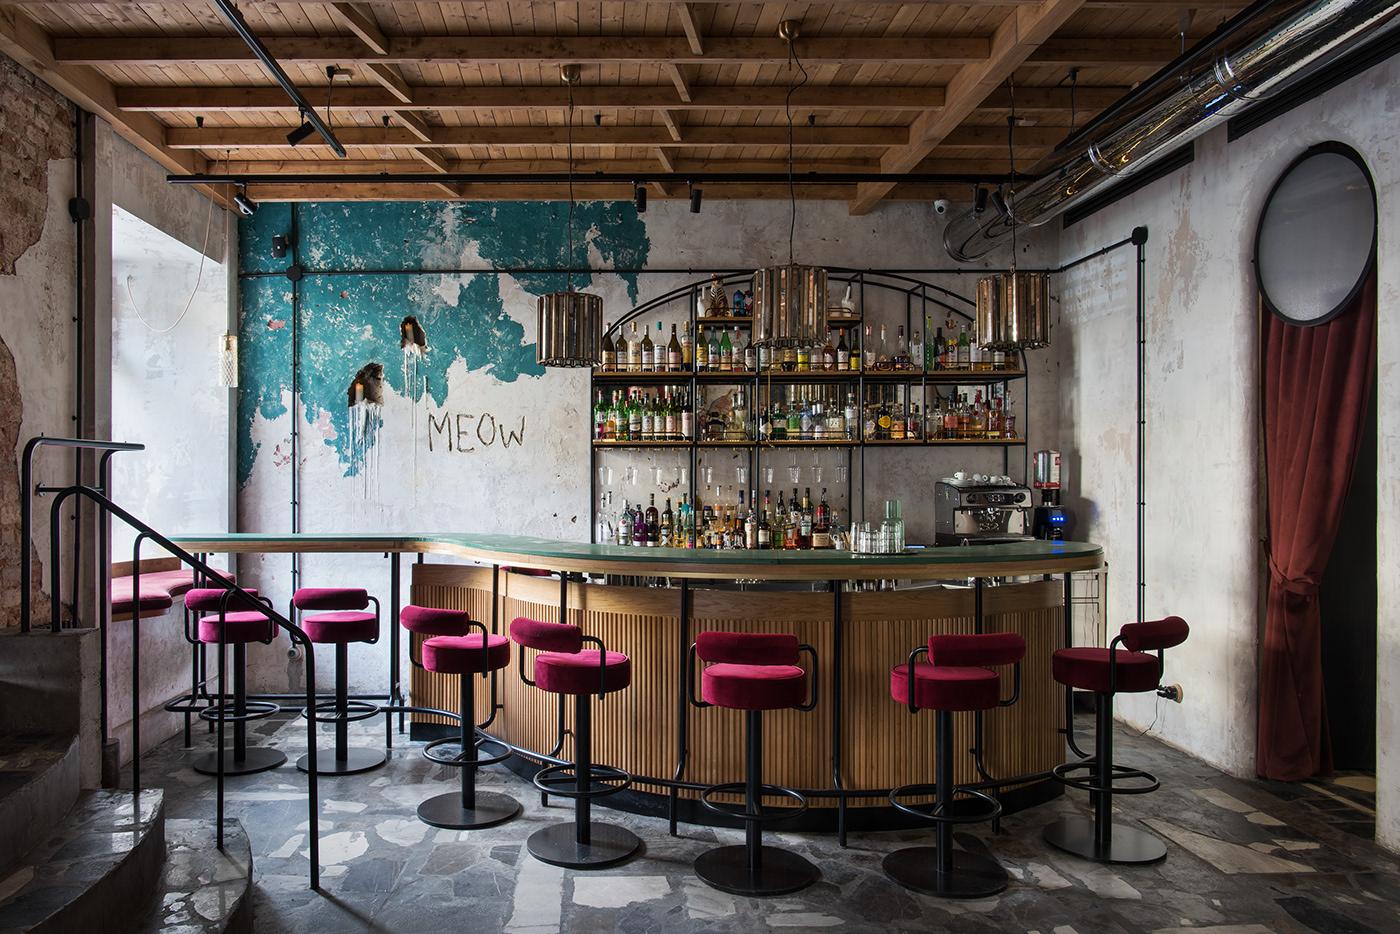 bar decor design HORECA Interior paum restaurant